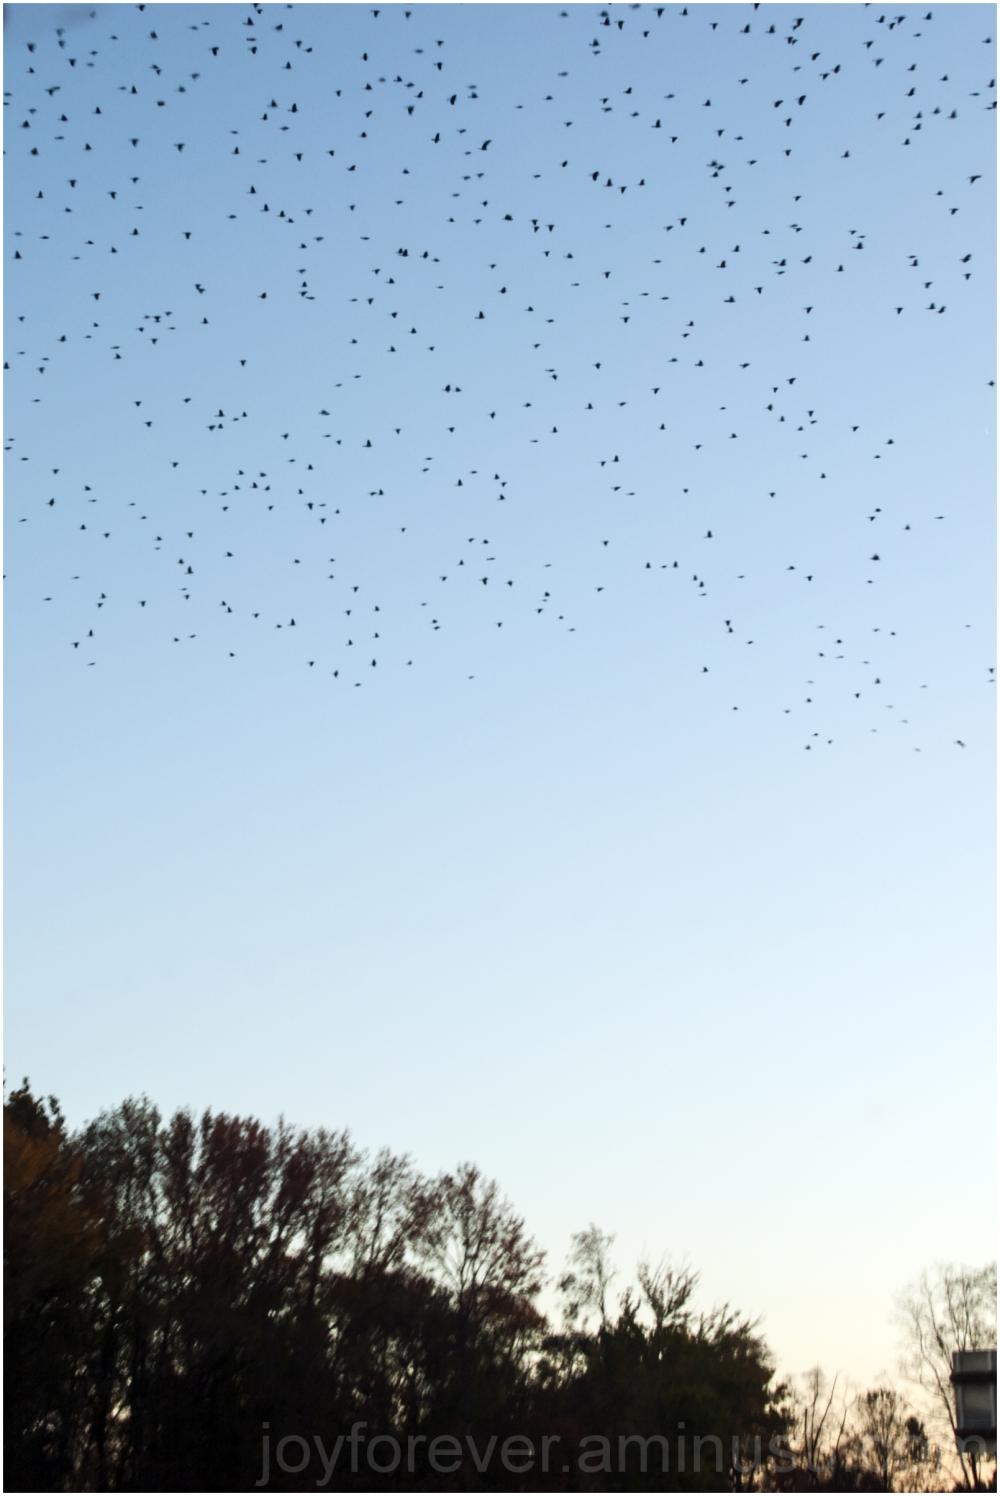 bird flock fly evening sky trees